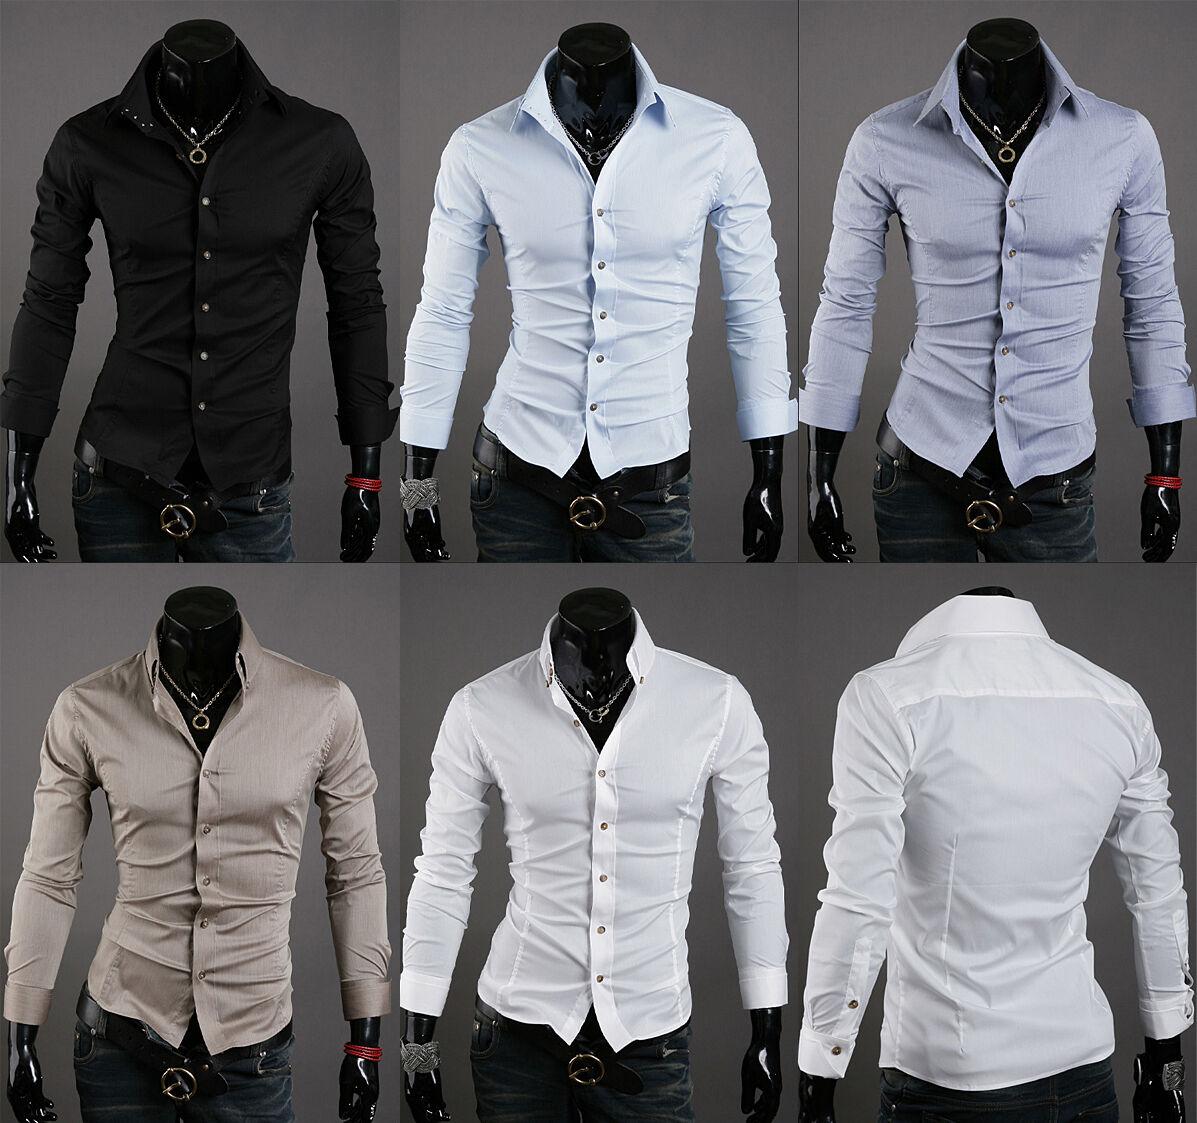 New mens slim fit 3 button t shirt for men dress shirts US sz XS S M L